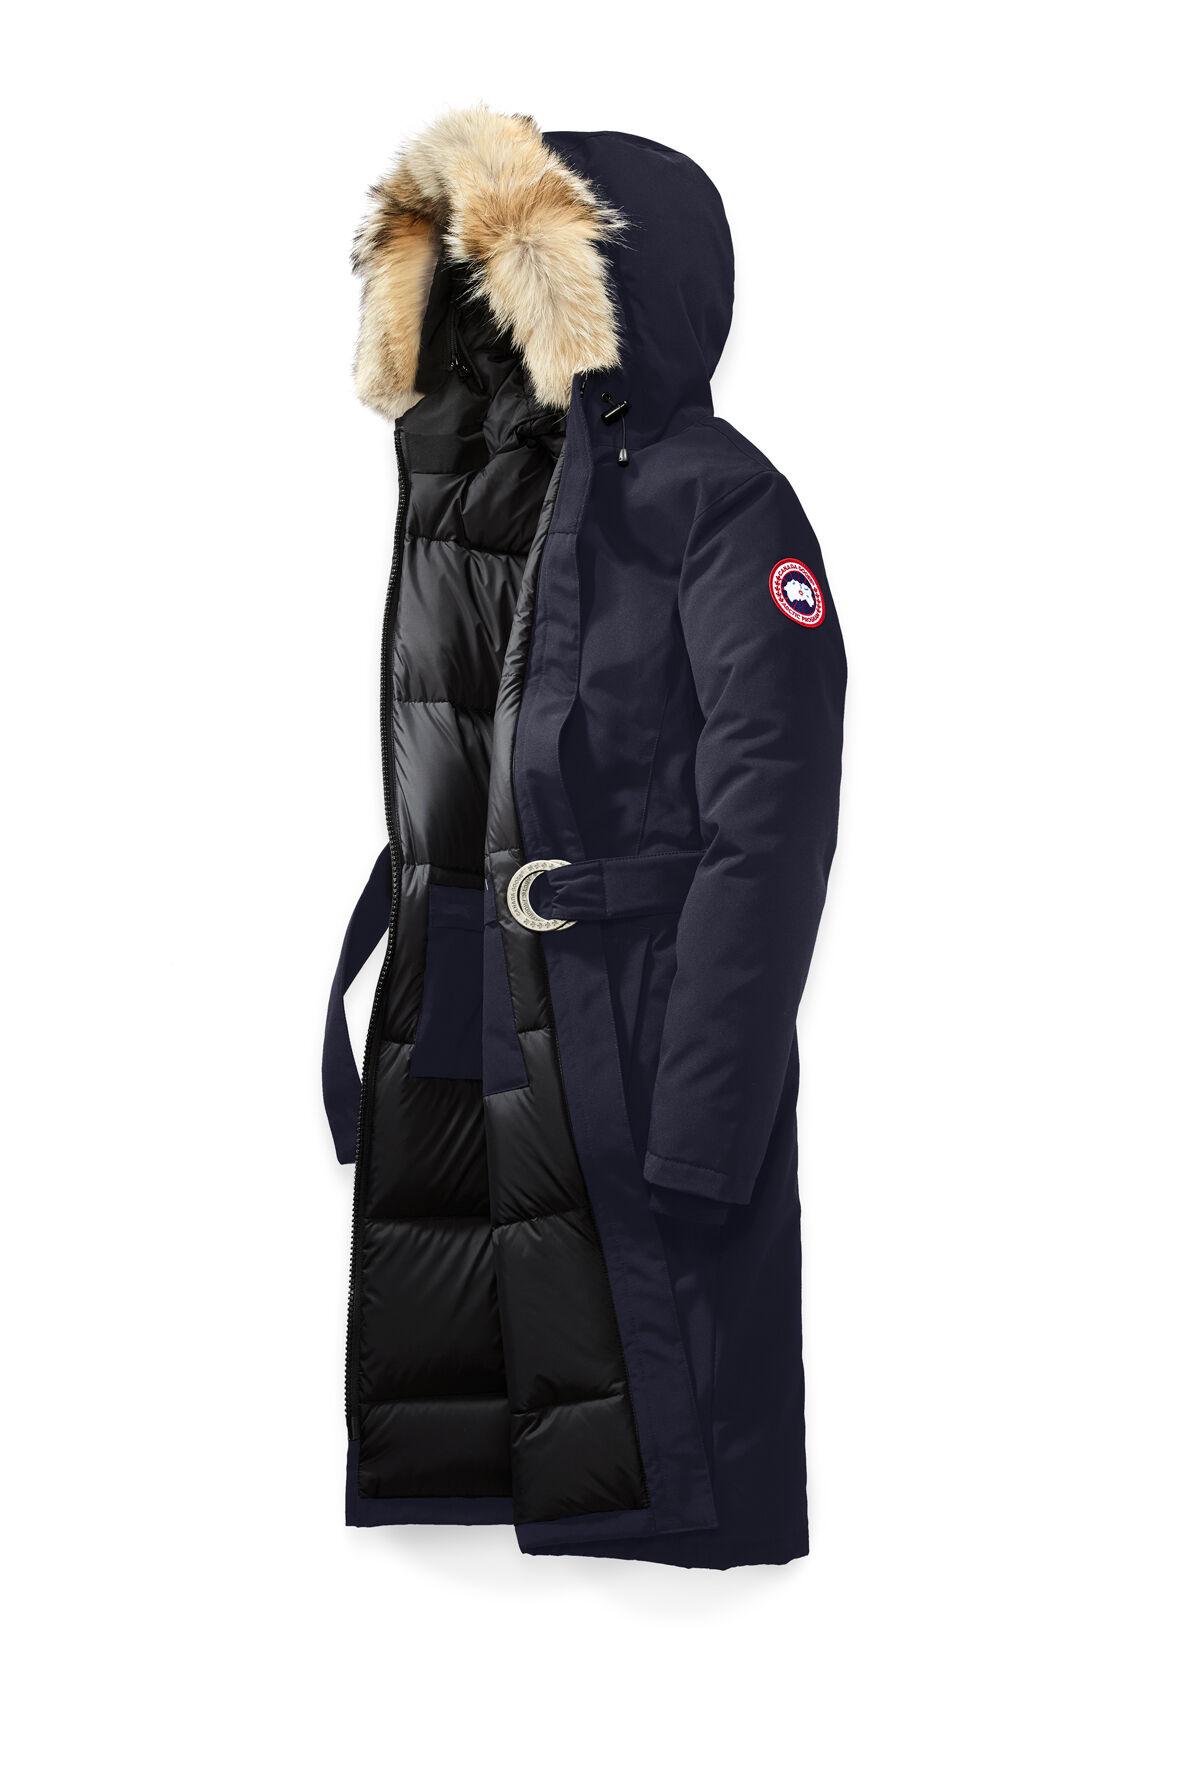 Canada goose jacket images